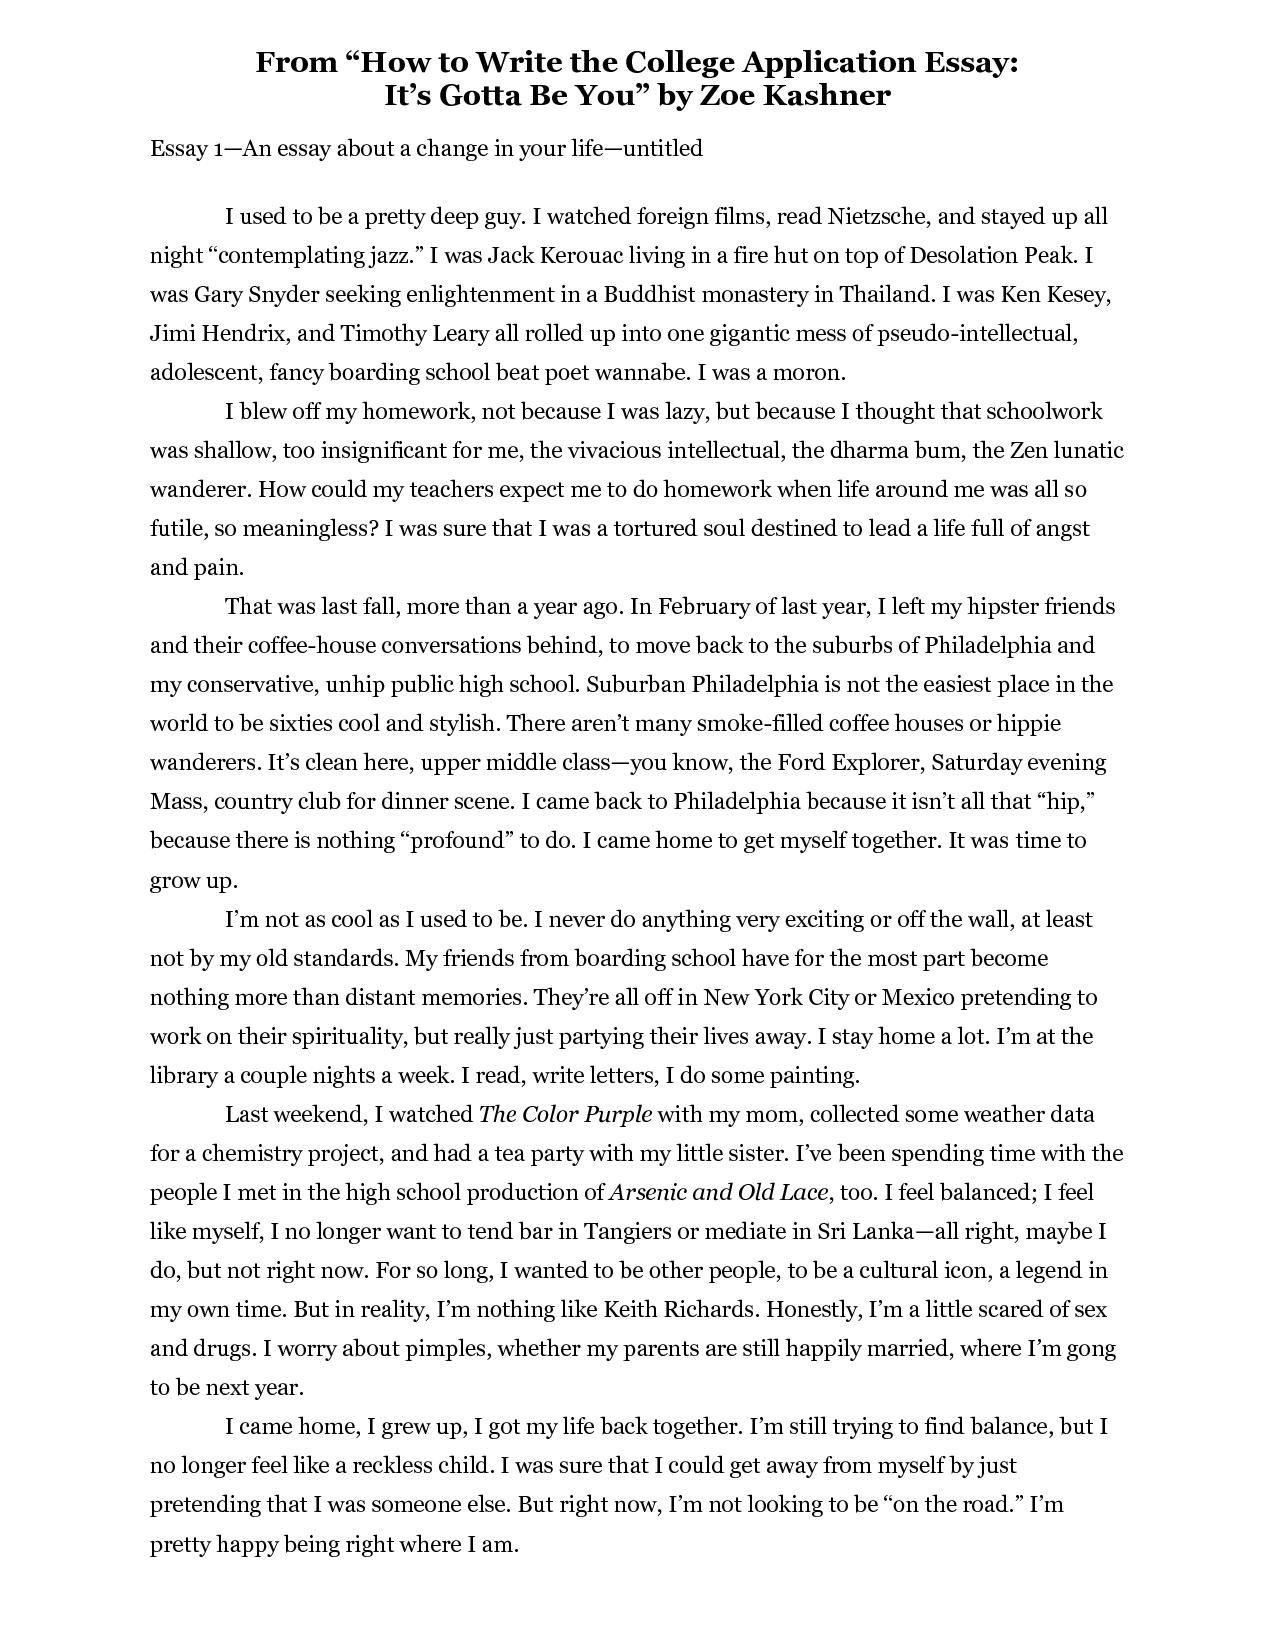 002 Oyt5kbffja Essay About Breathtaking Bullying English Love 300 Words Leadership Styles Full